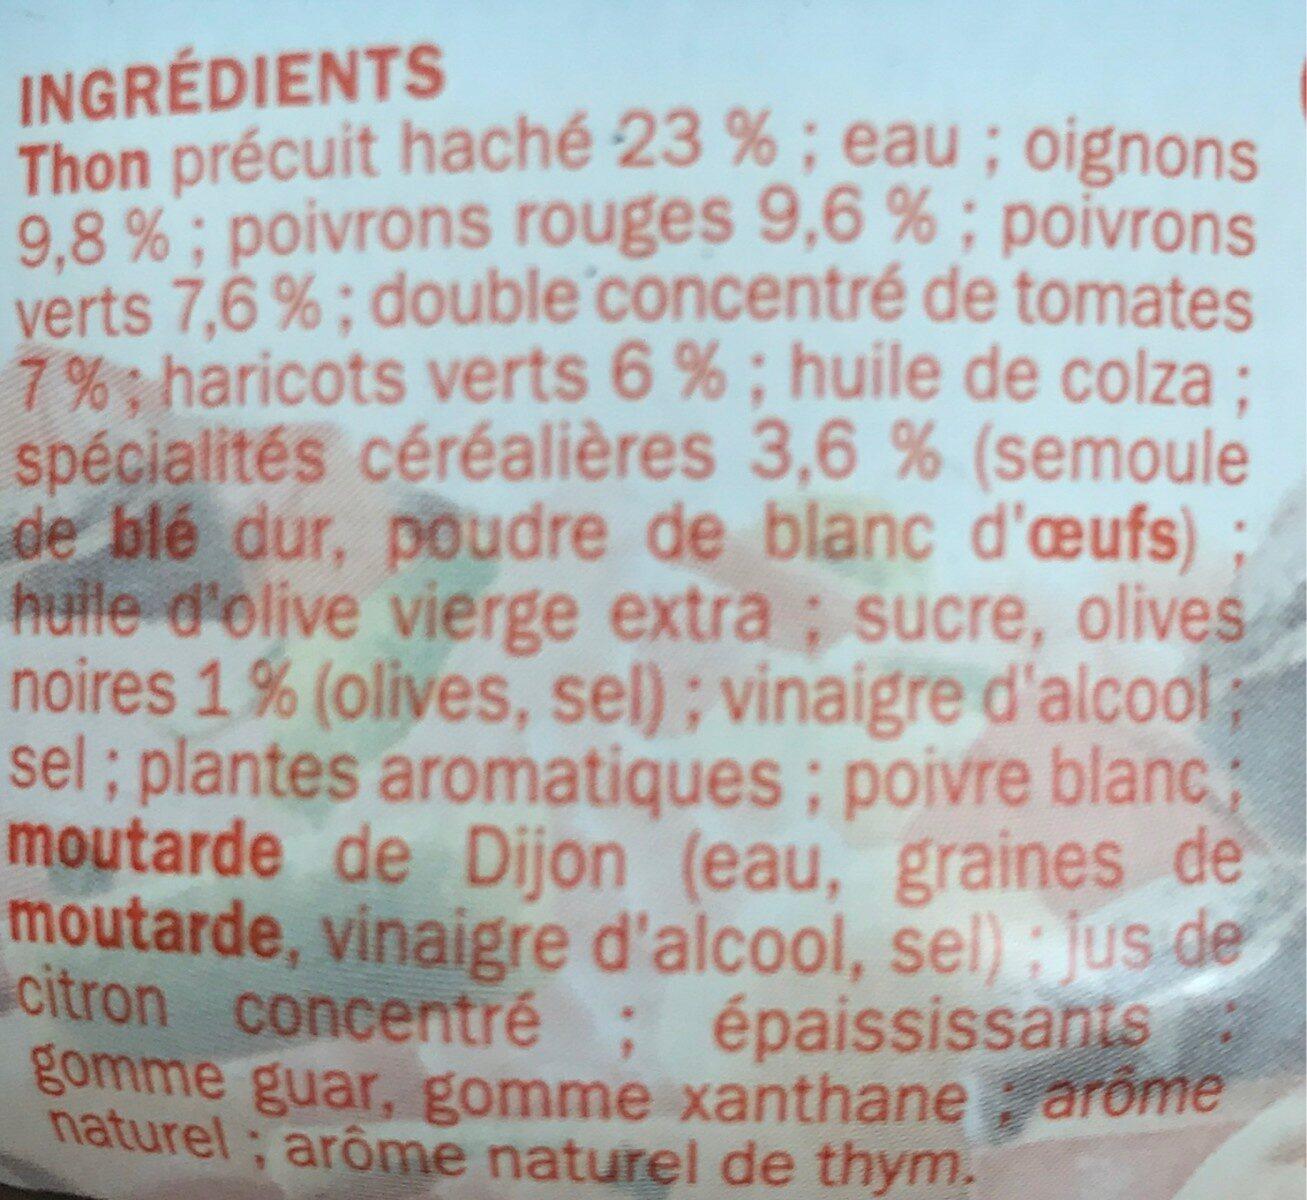 Salade catalane au thon - Ingredients - fr